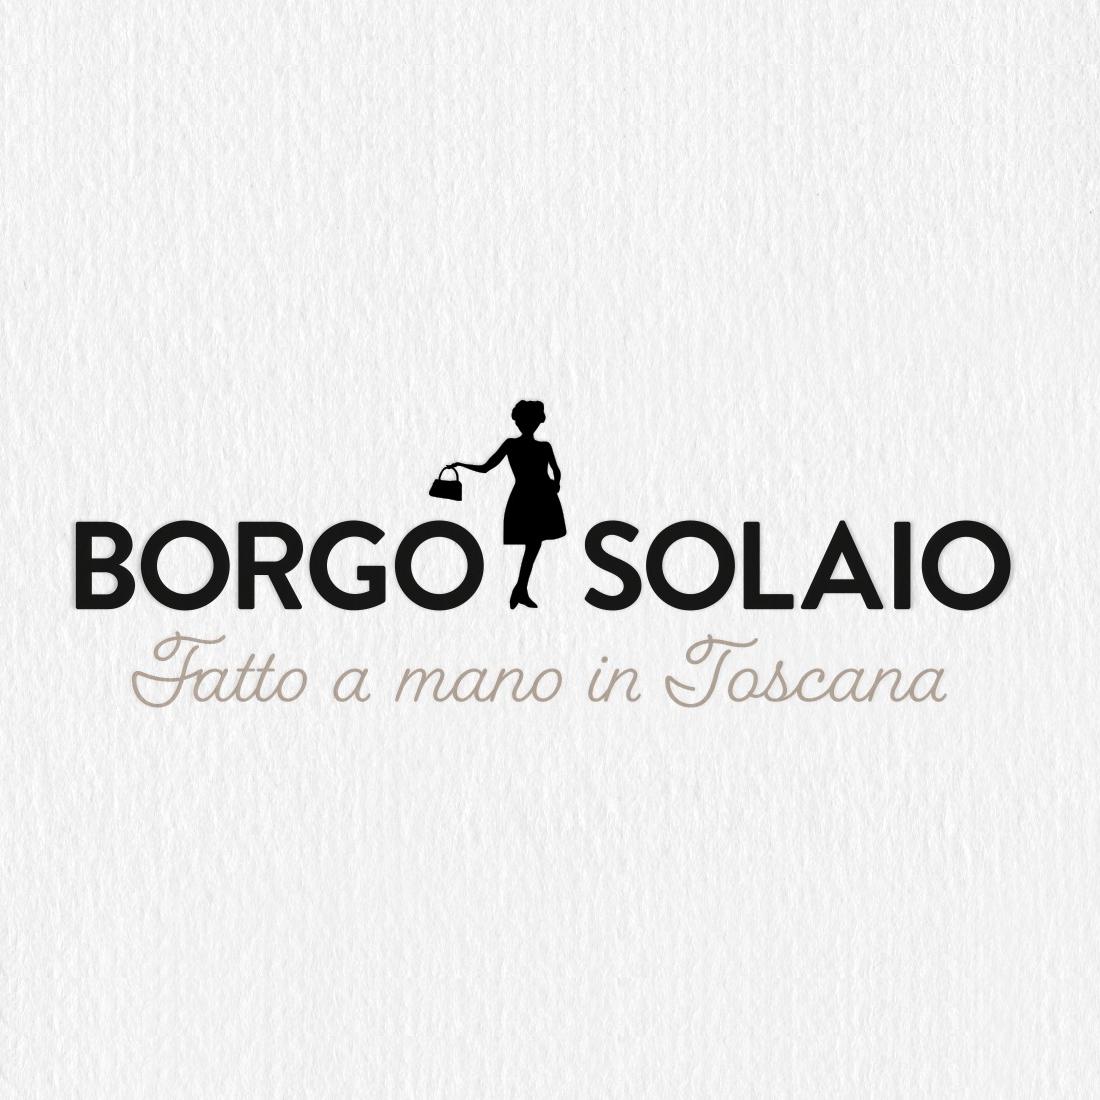 borgo-solaio-borsai-pietrasanta-lucca-profile